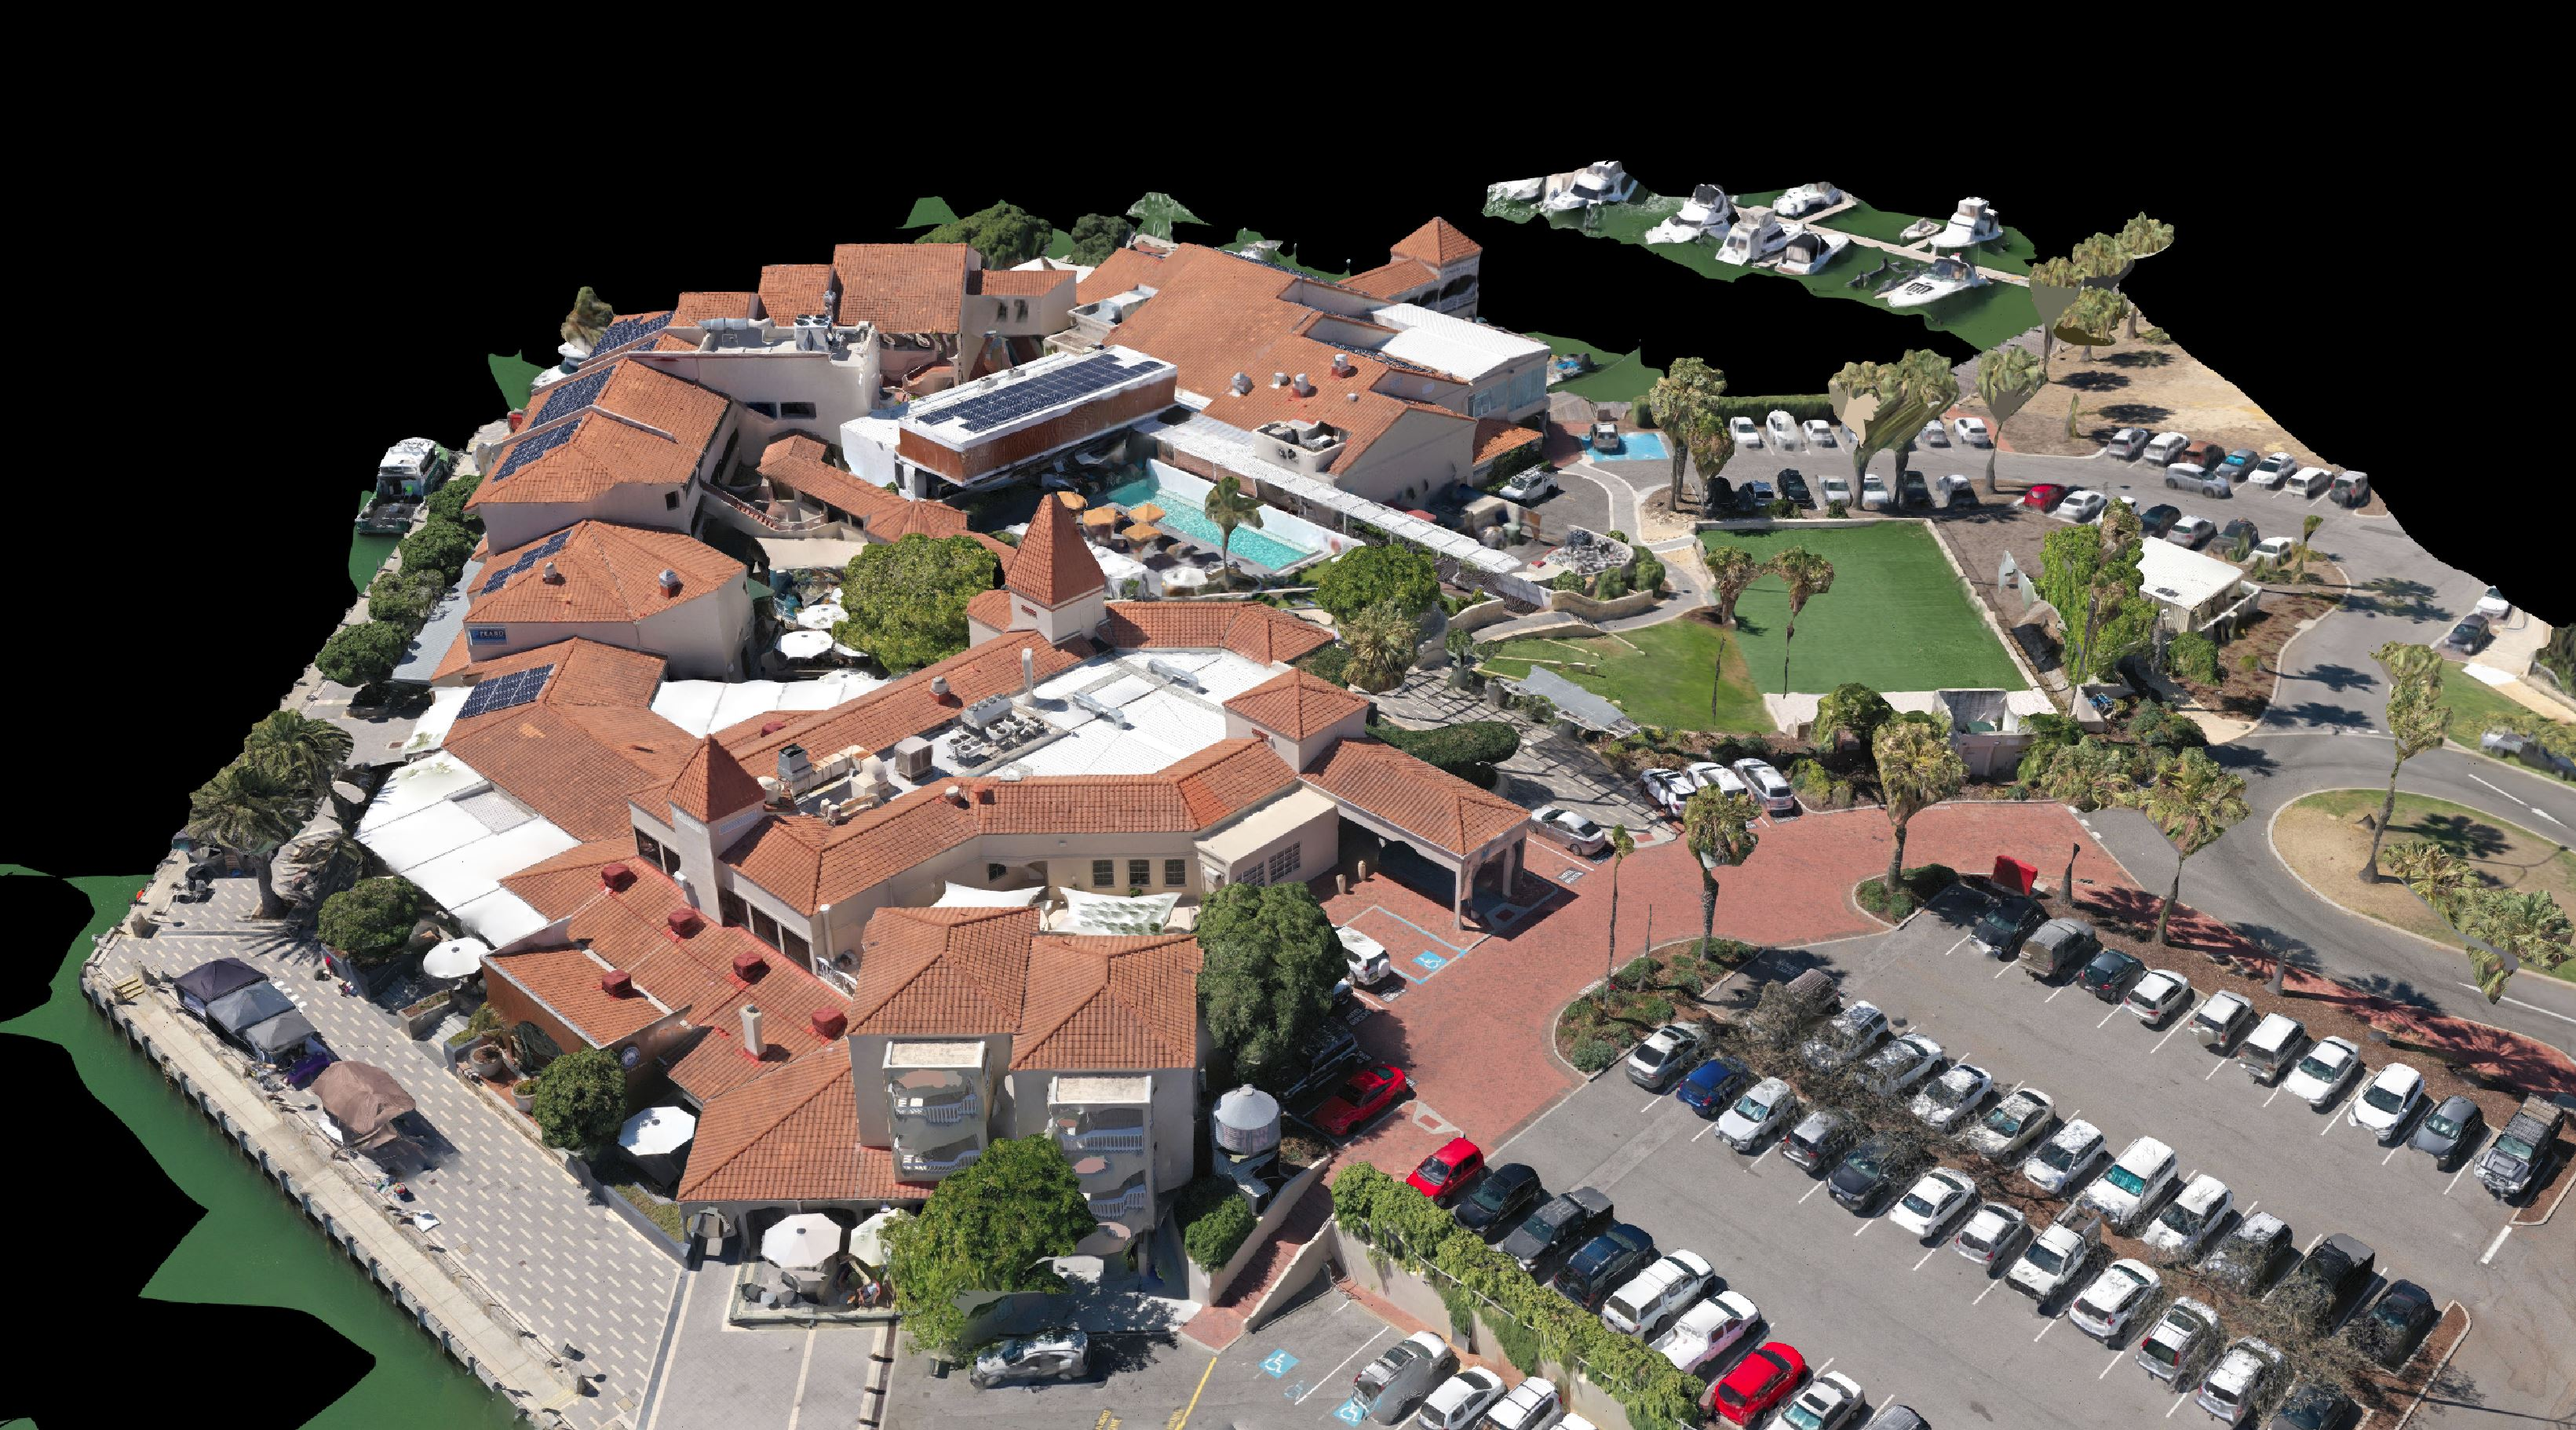 drone-image-wa-perth-3d-mapping